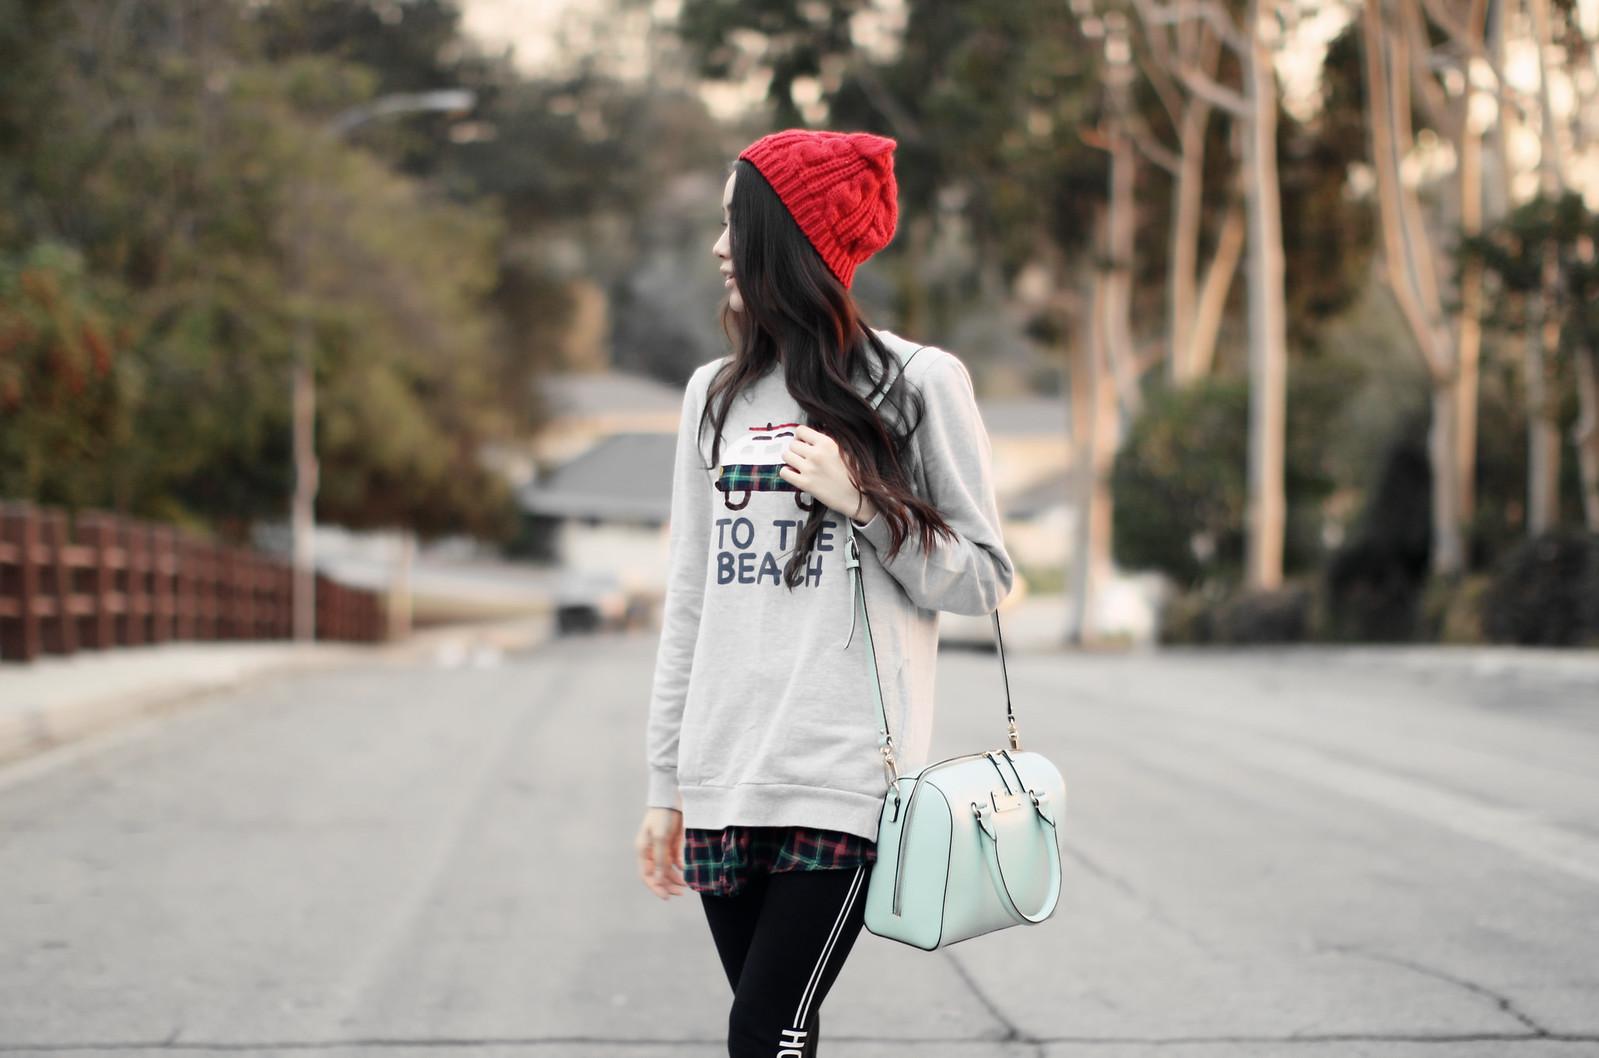 1279-ootd-sweaterdress-koreanfashion-asianfashion-korean-fall-yesstyle-sweaterweather-clothestoyouuu-blogger-elizabeeetht